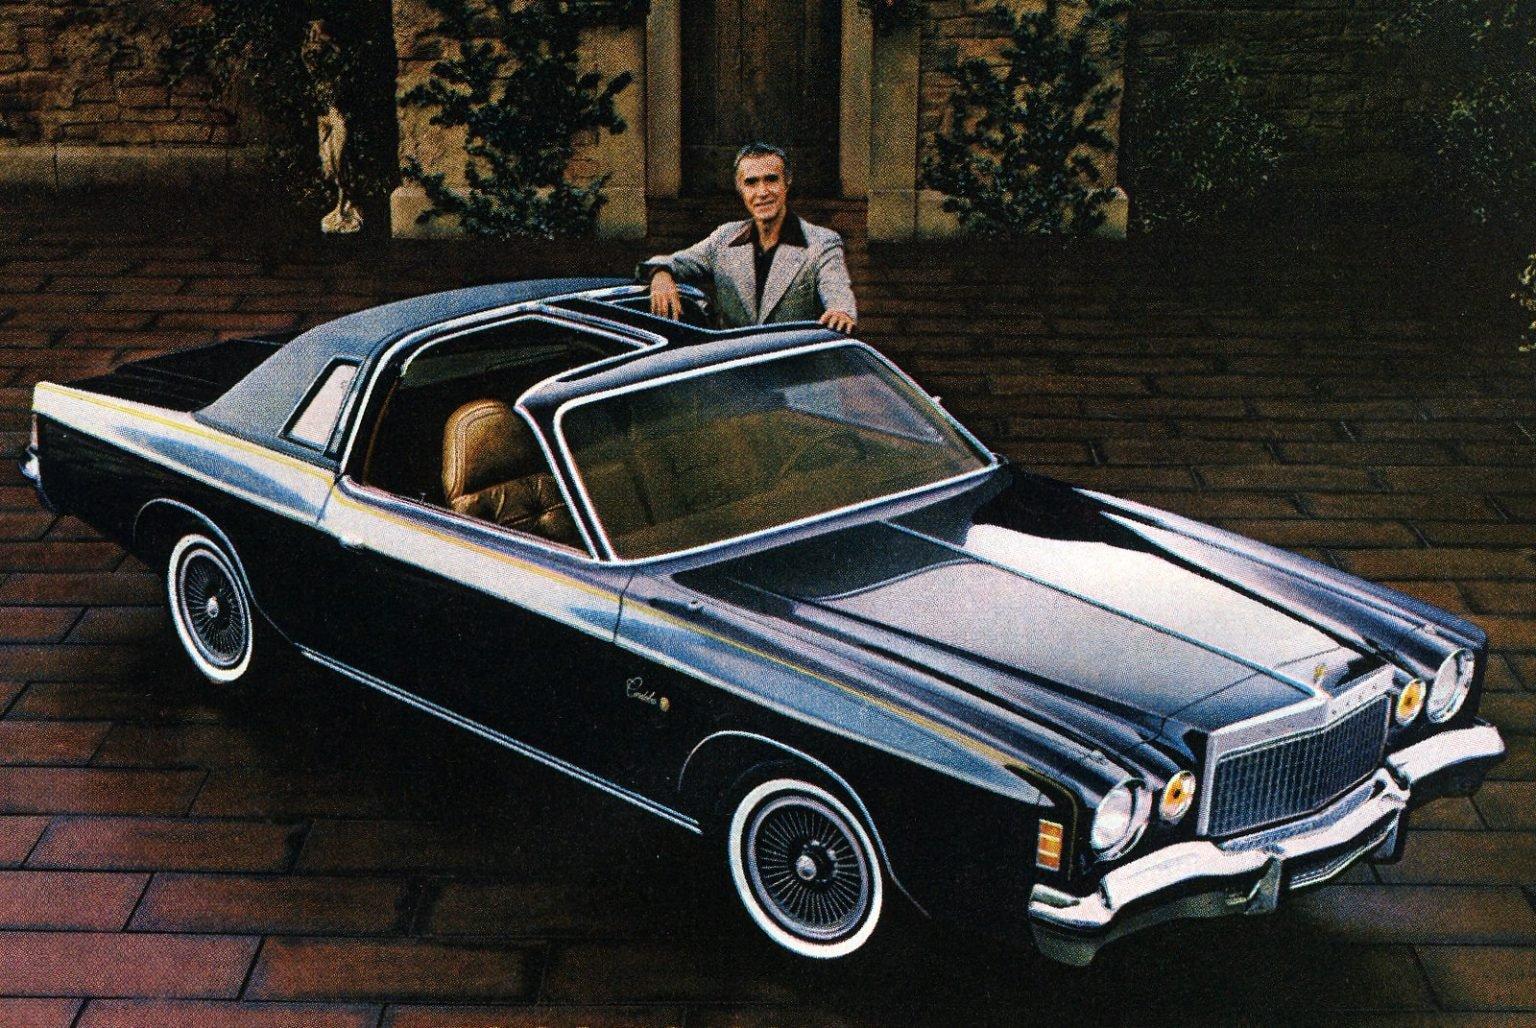 See Ricardo Montalban pitching Chrysler Cordoba - the car with 'soft Corinthian leather'